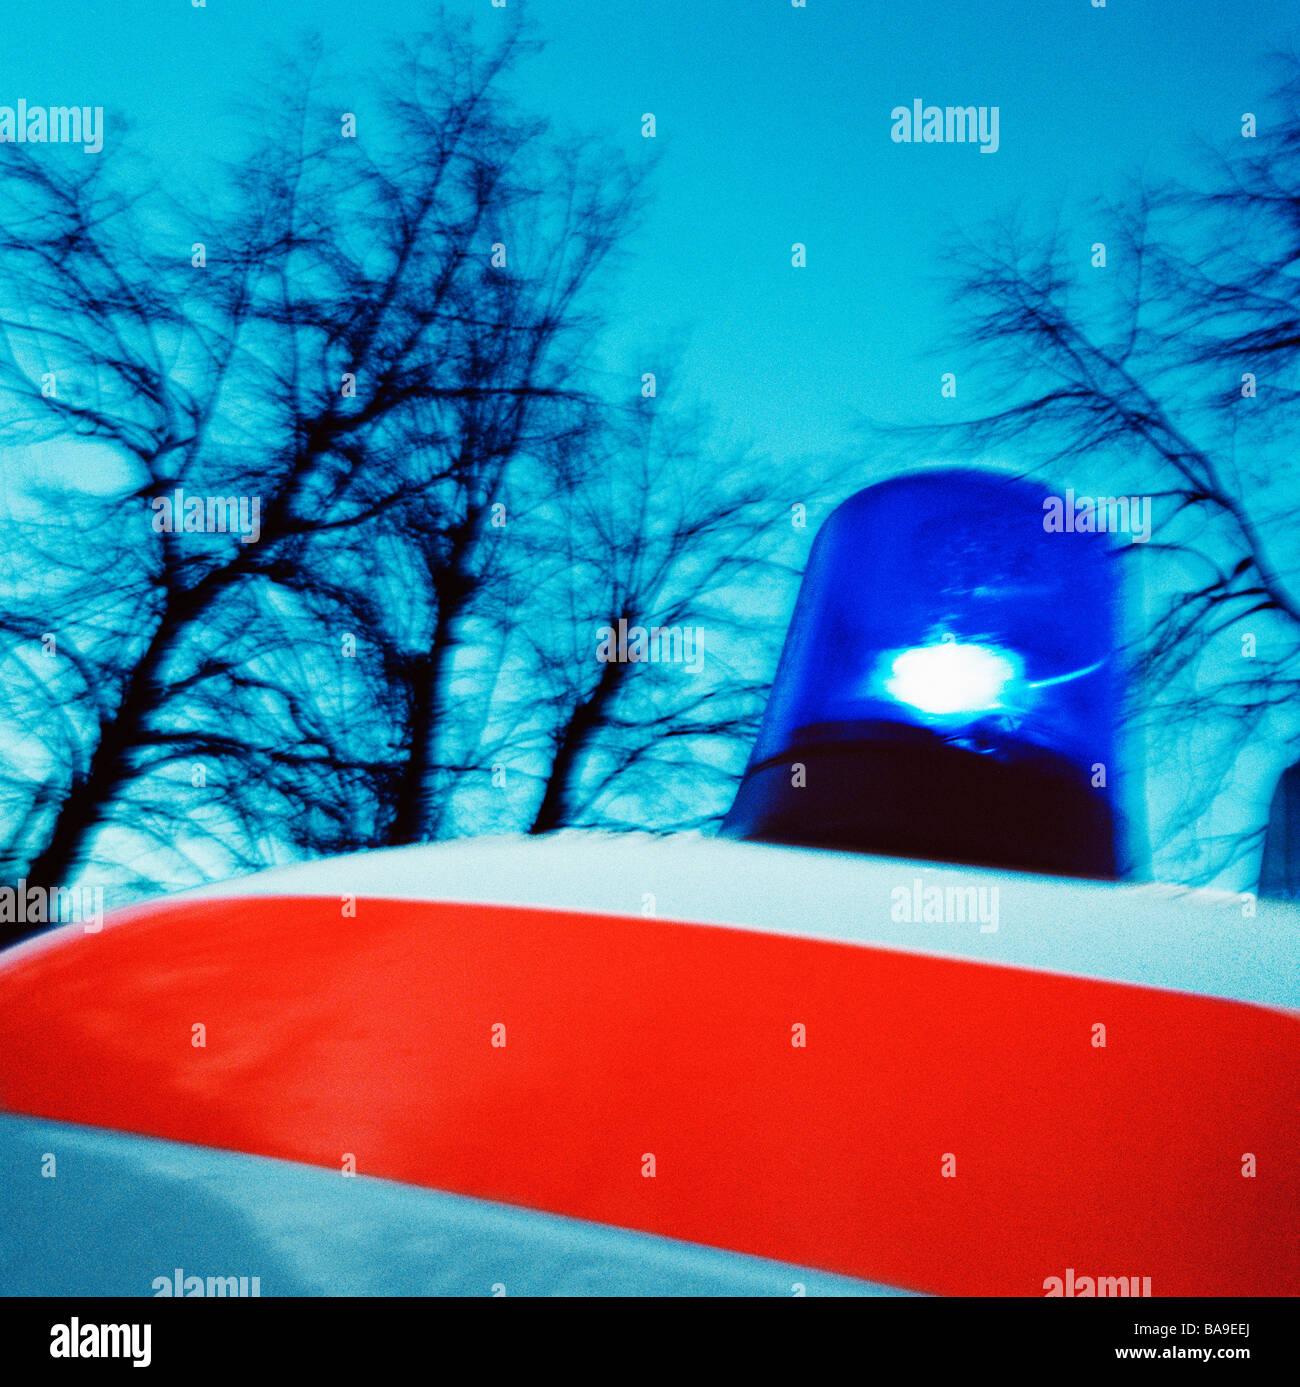 Ambulance siren, close-up. - Stock Image